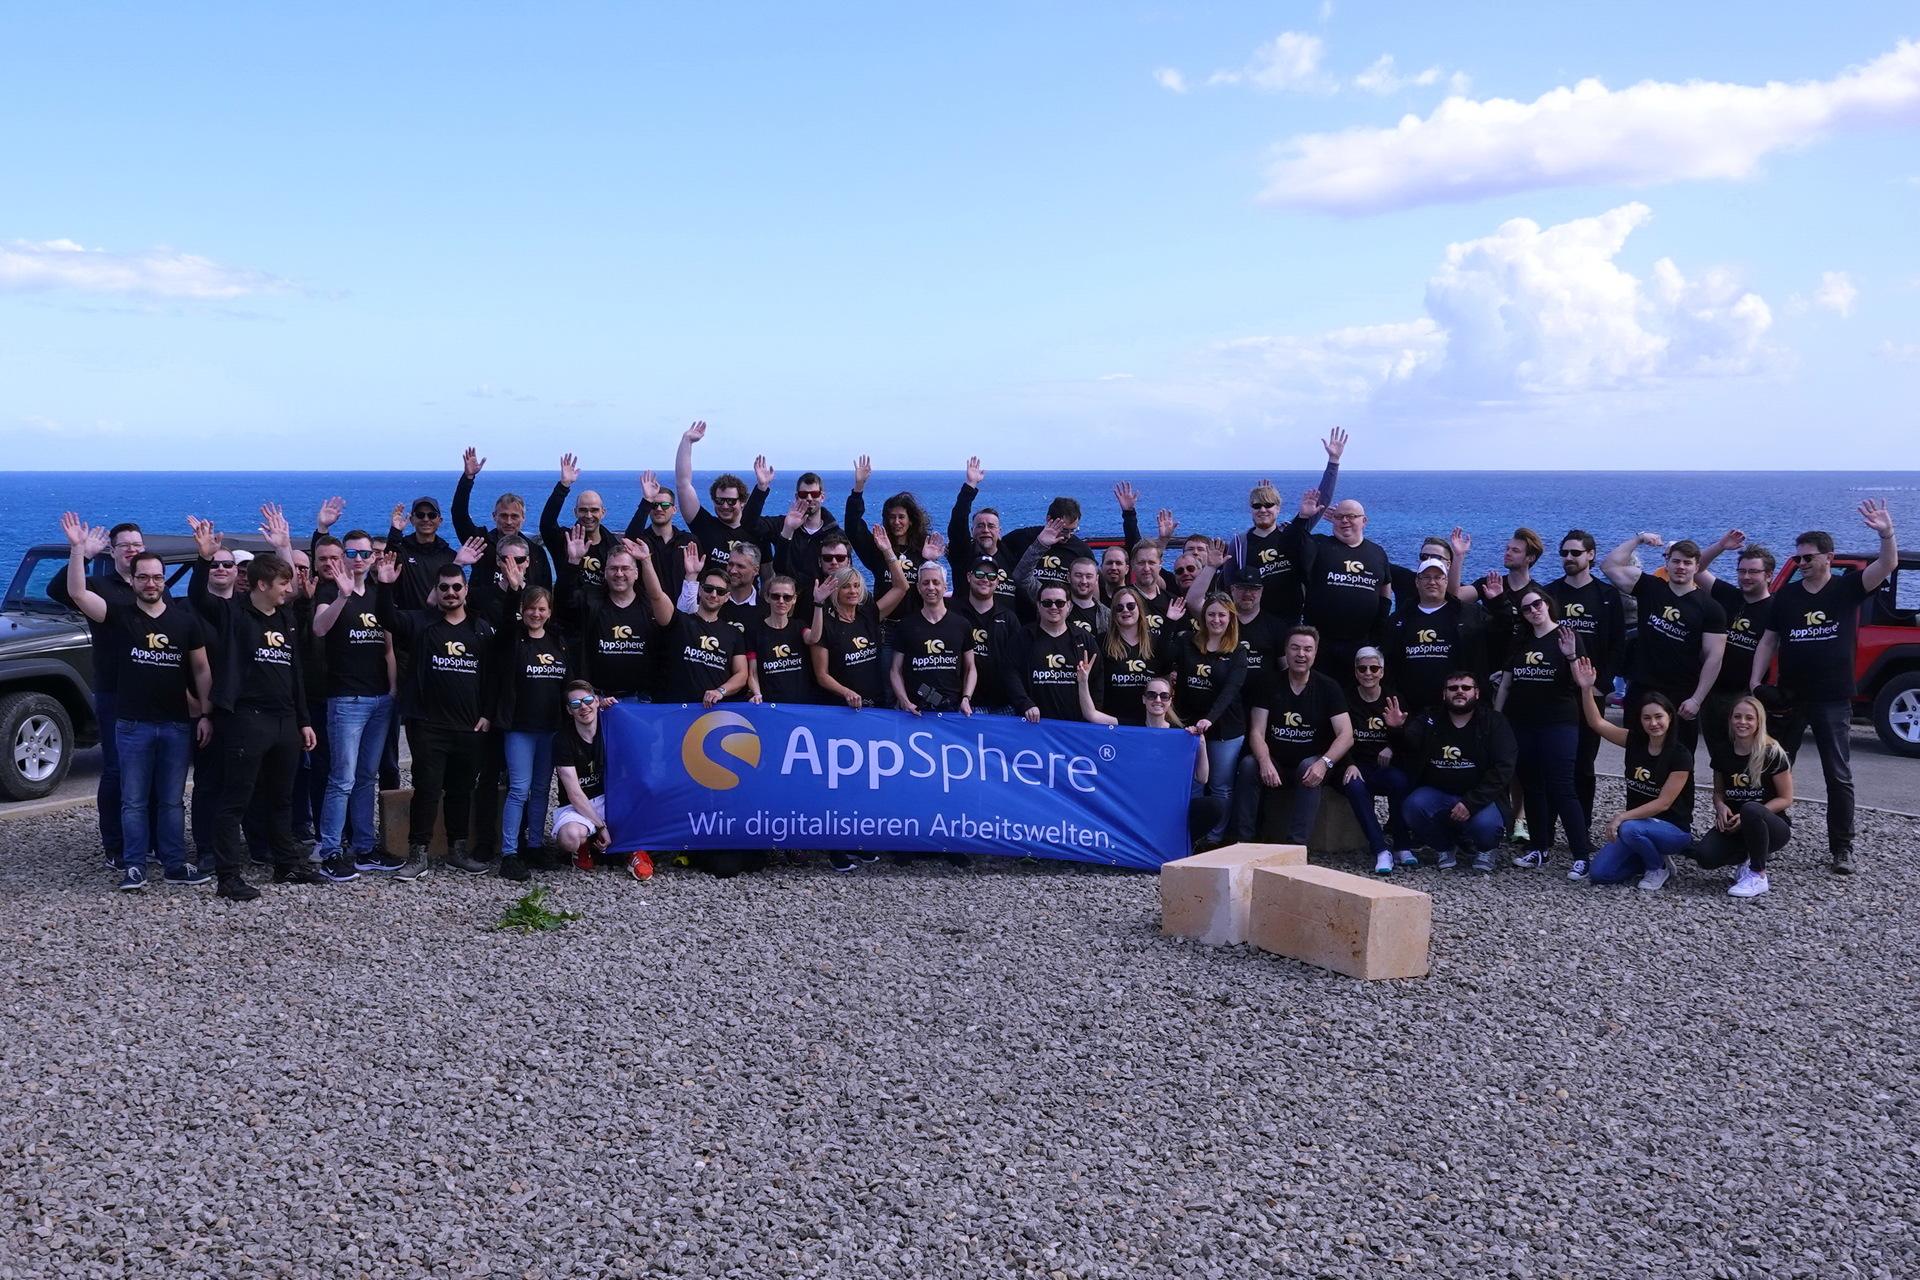 AppSphere AG Impression